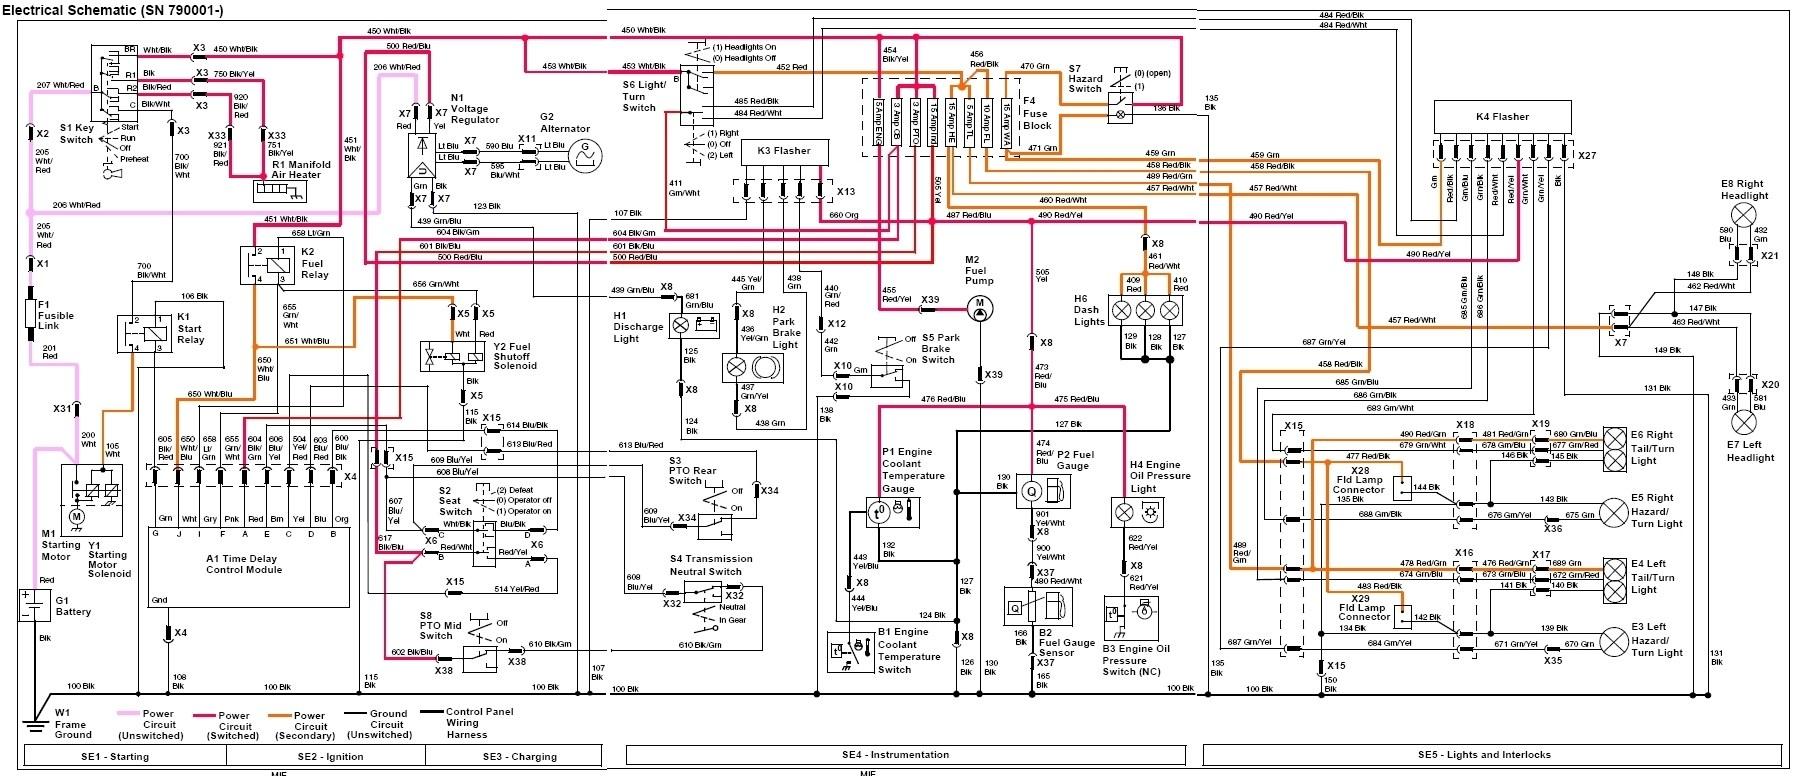 John Deere 5200 Wiring Diagram - Fuel Filter Location 2005 Chevy Truck -  toshiba.ke2x.jeanjaures37.frWiring Diagram Resource